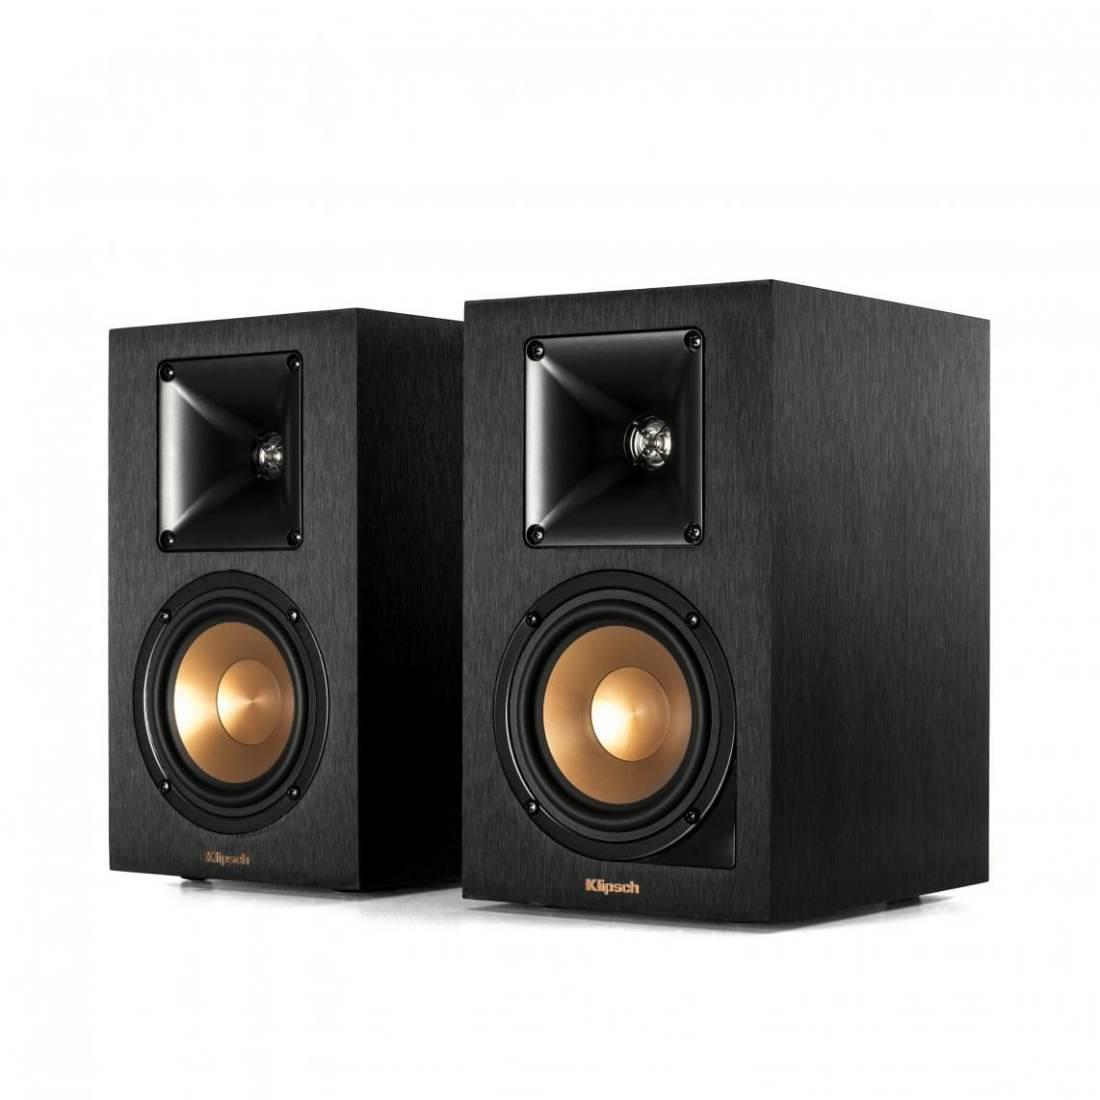 klipsch tower speakers. klipsch r-14pm tower speakers v